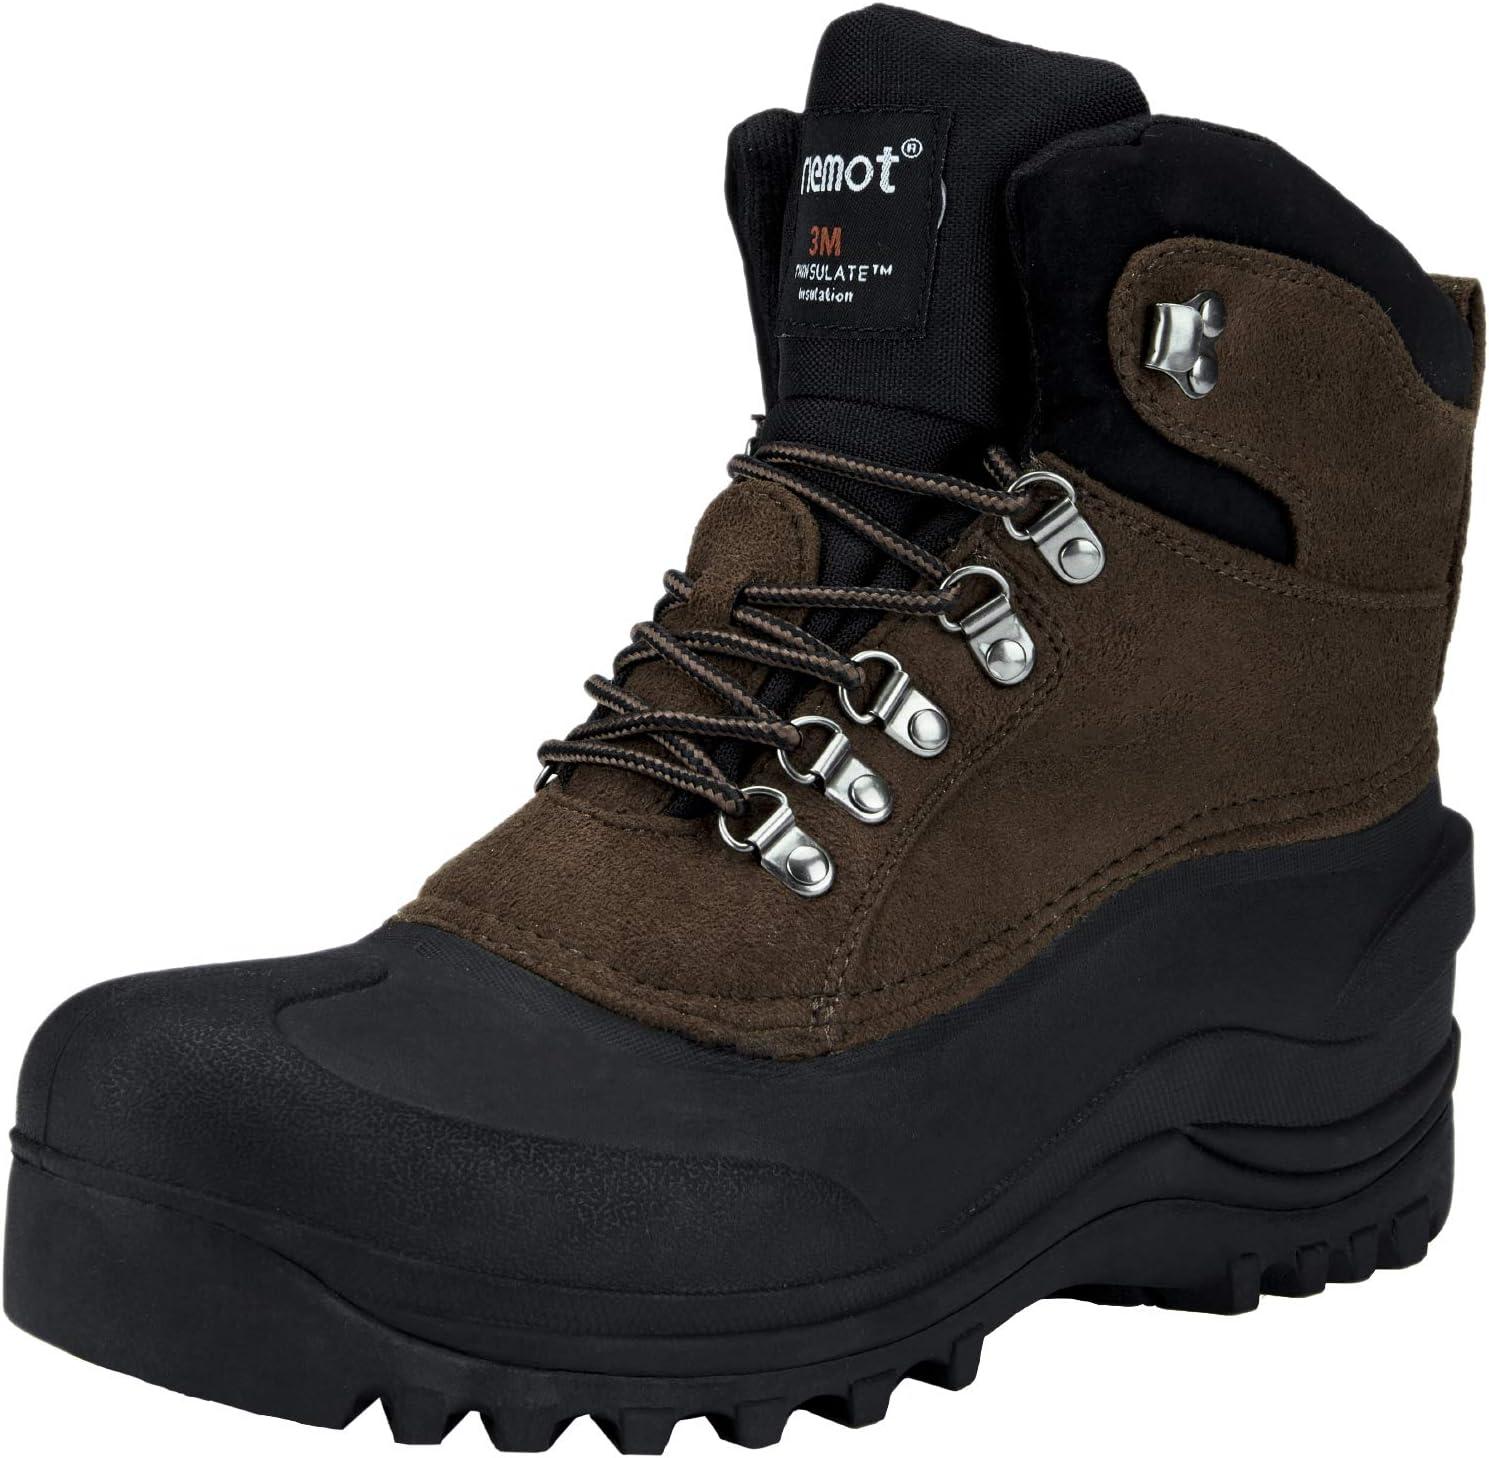 riemot Mens Max 69% OFF Snow Boots Waterproof Hiking for Trekk Japan Maker New Winter